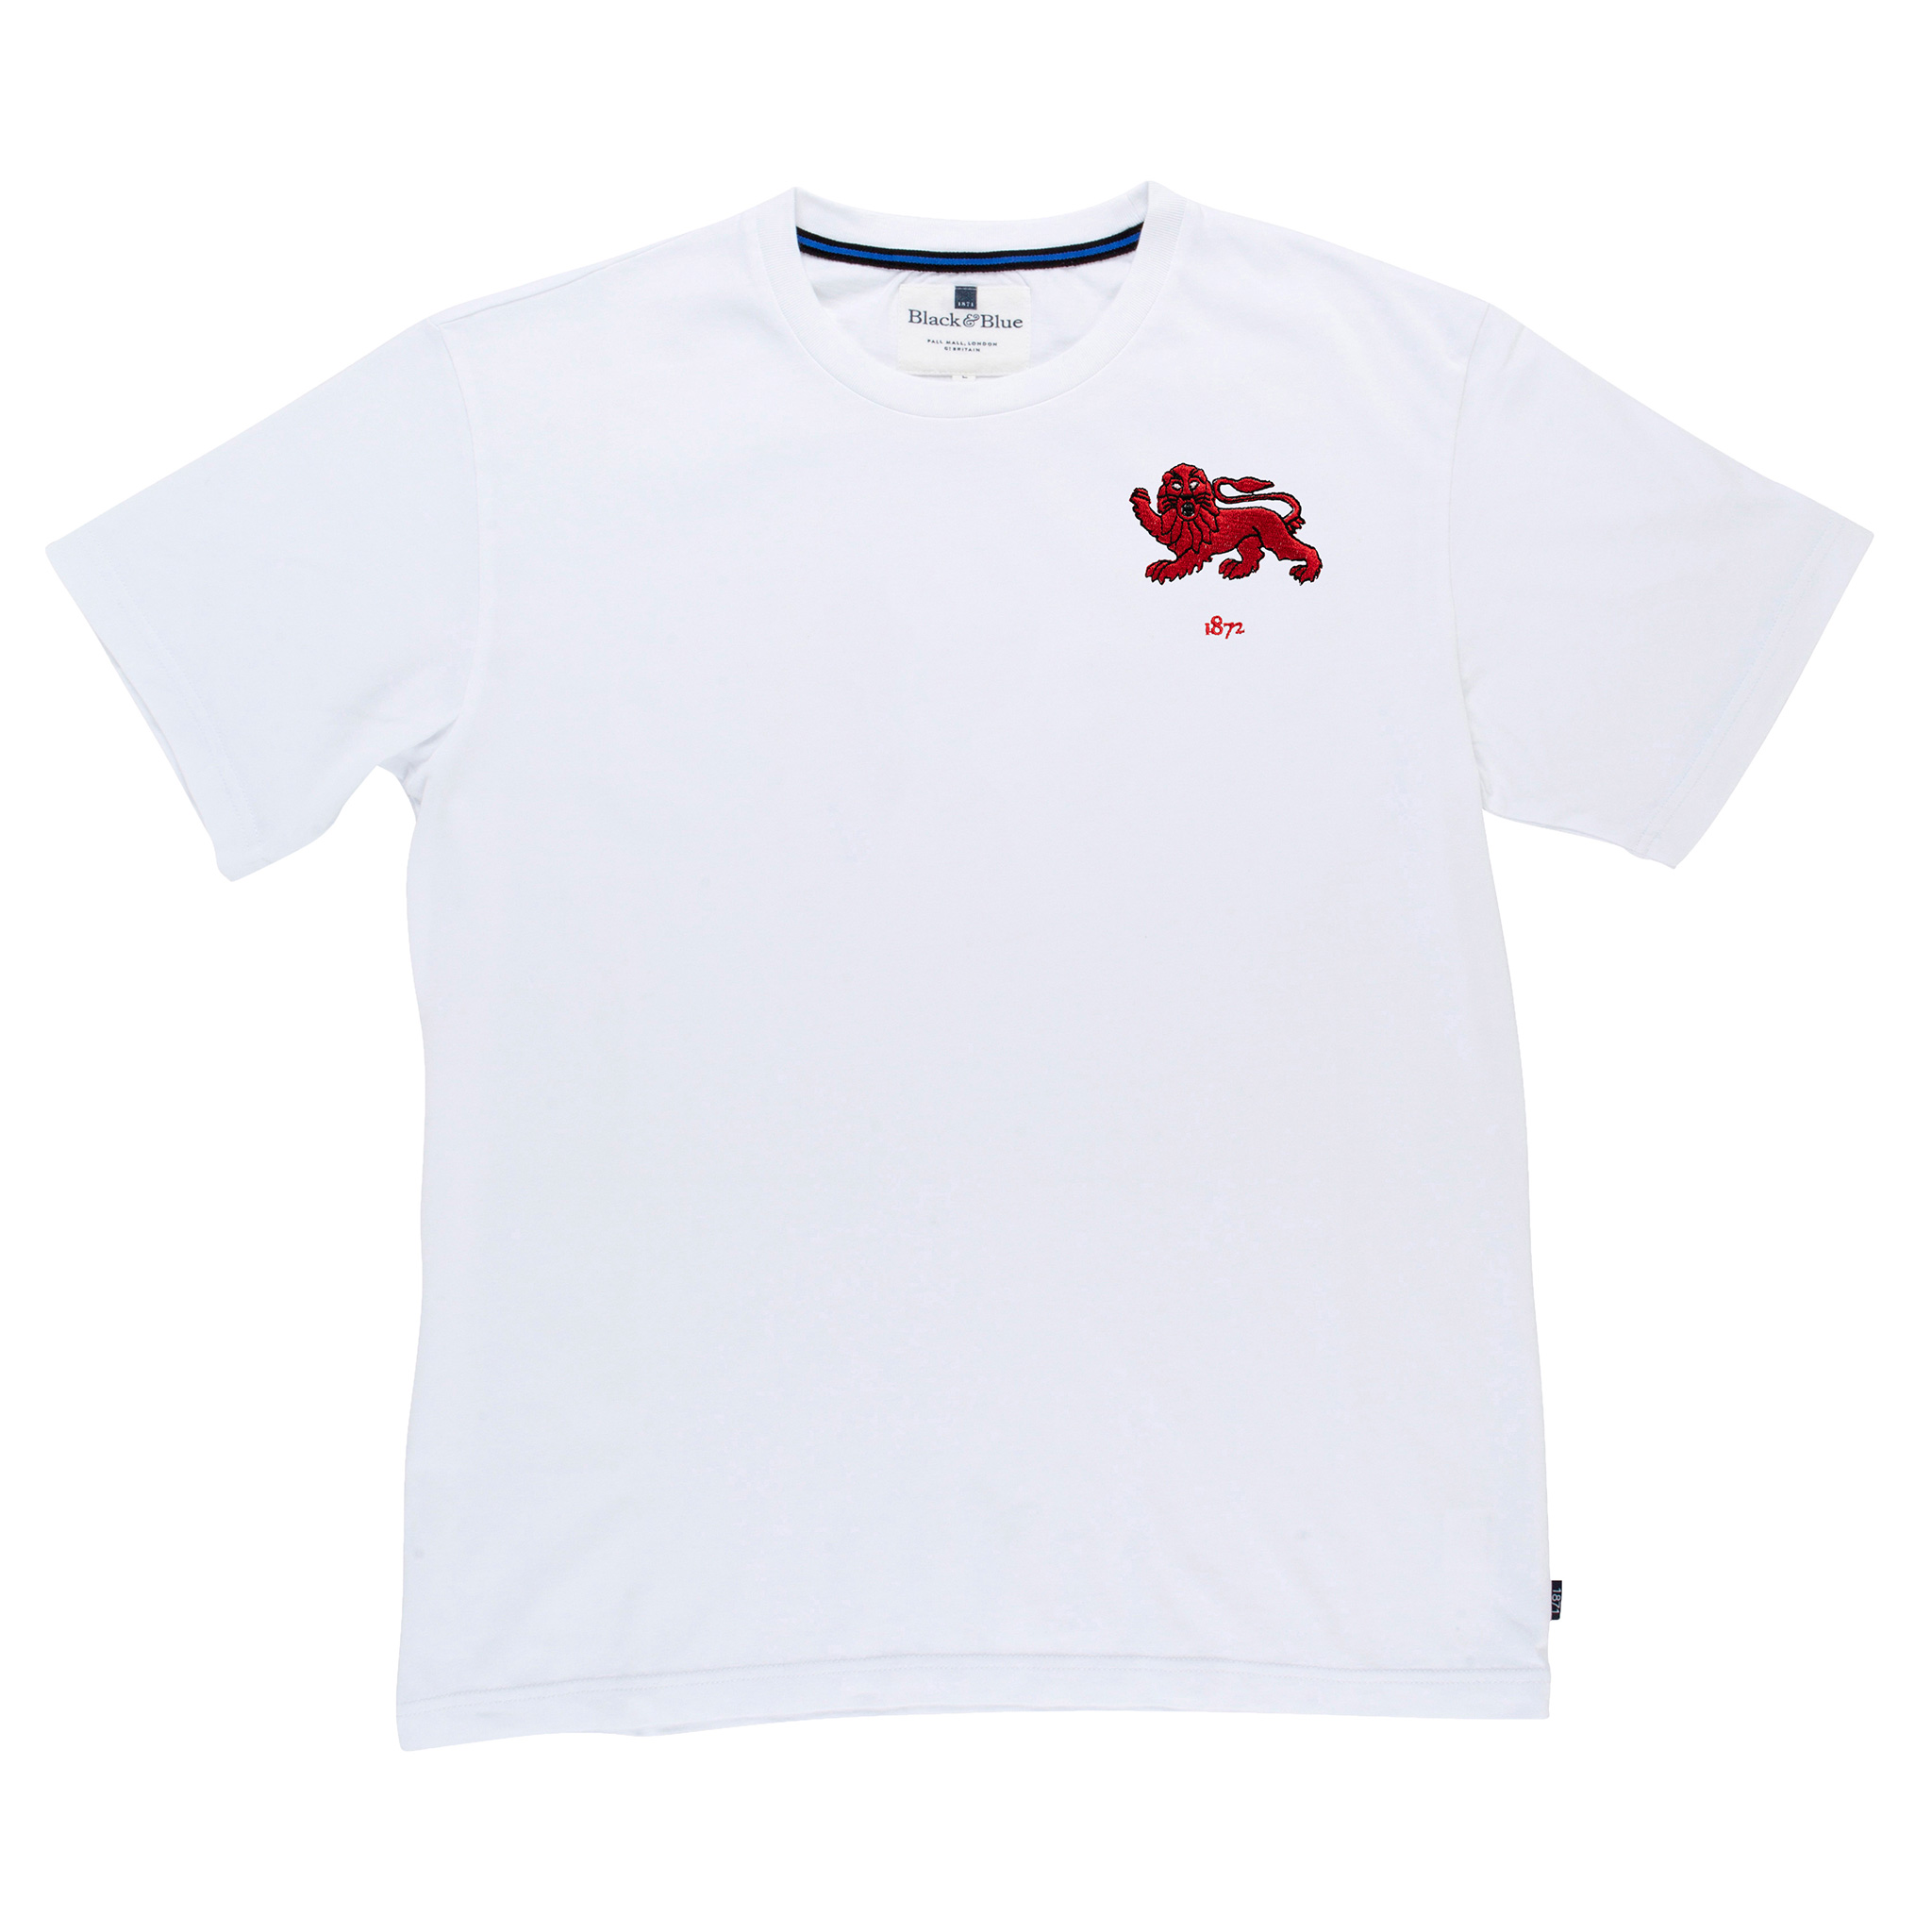 Cambridge 1872 White Tshirt_Front